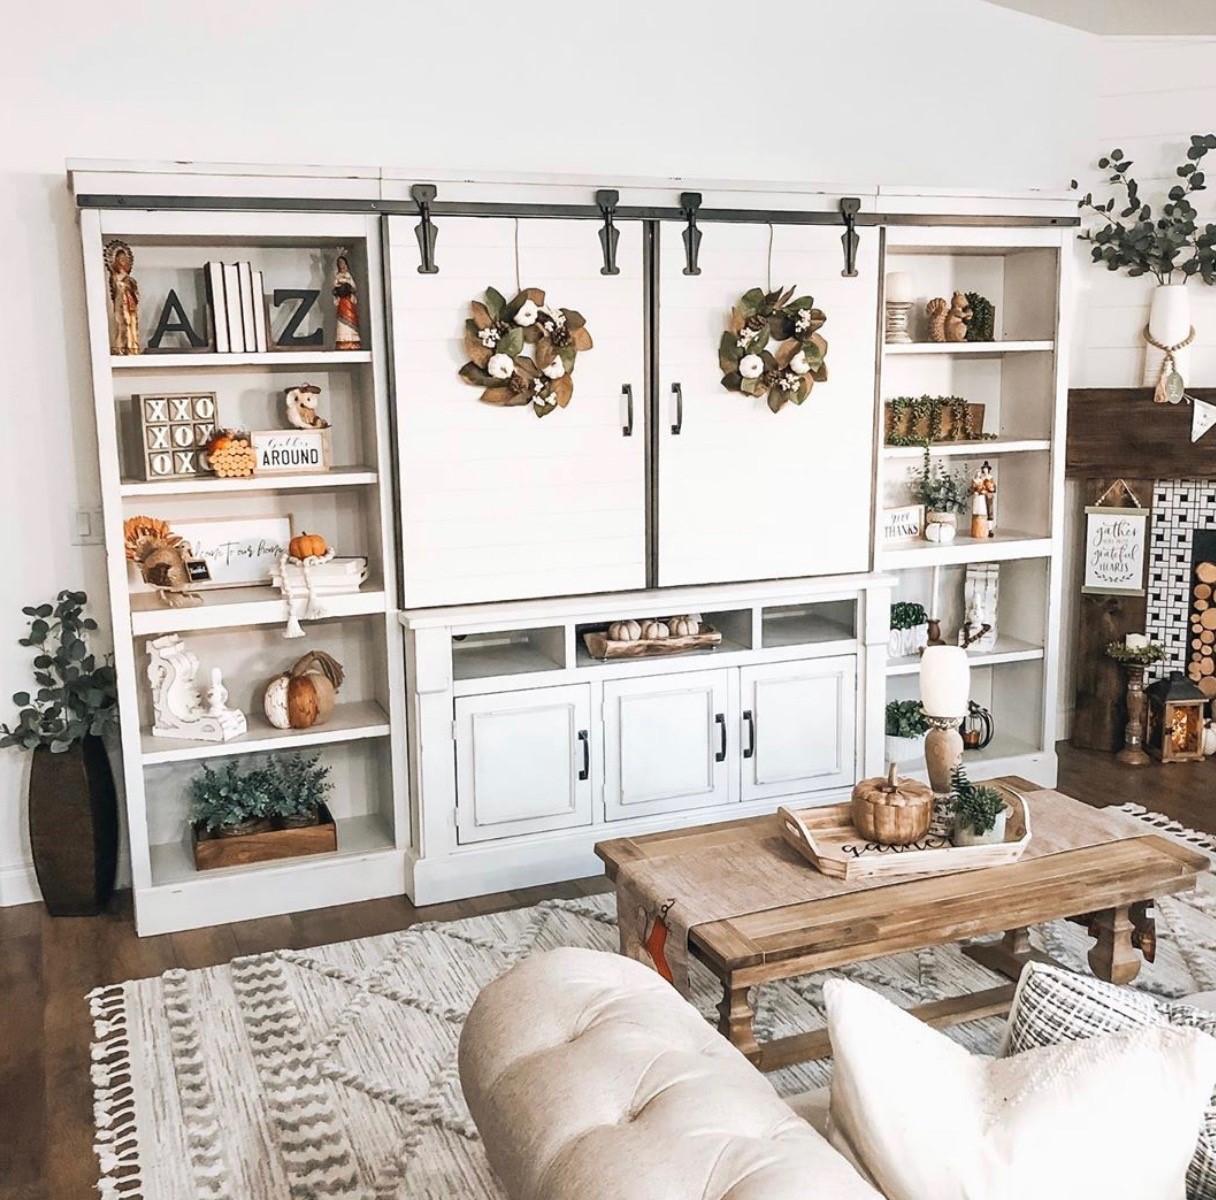 Ashley Furniture HomeStore 25415 Interstate 45 N, Spring